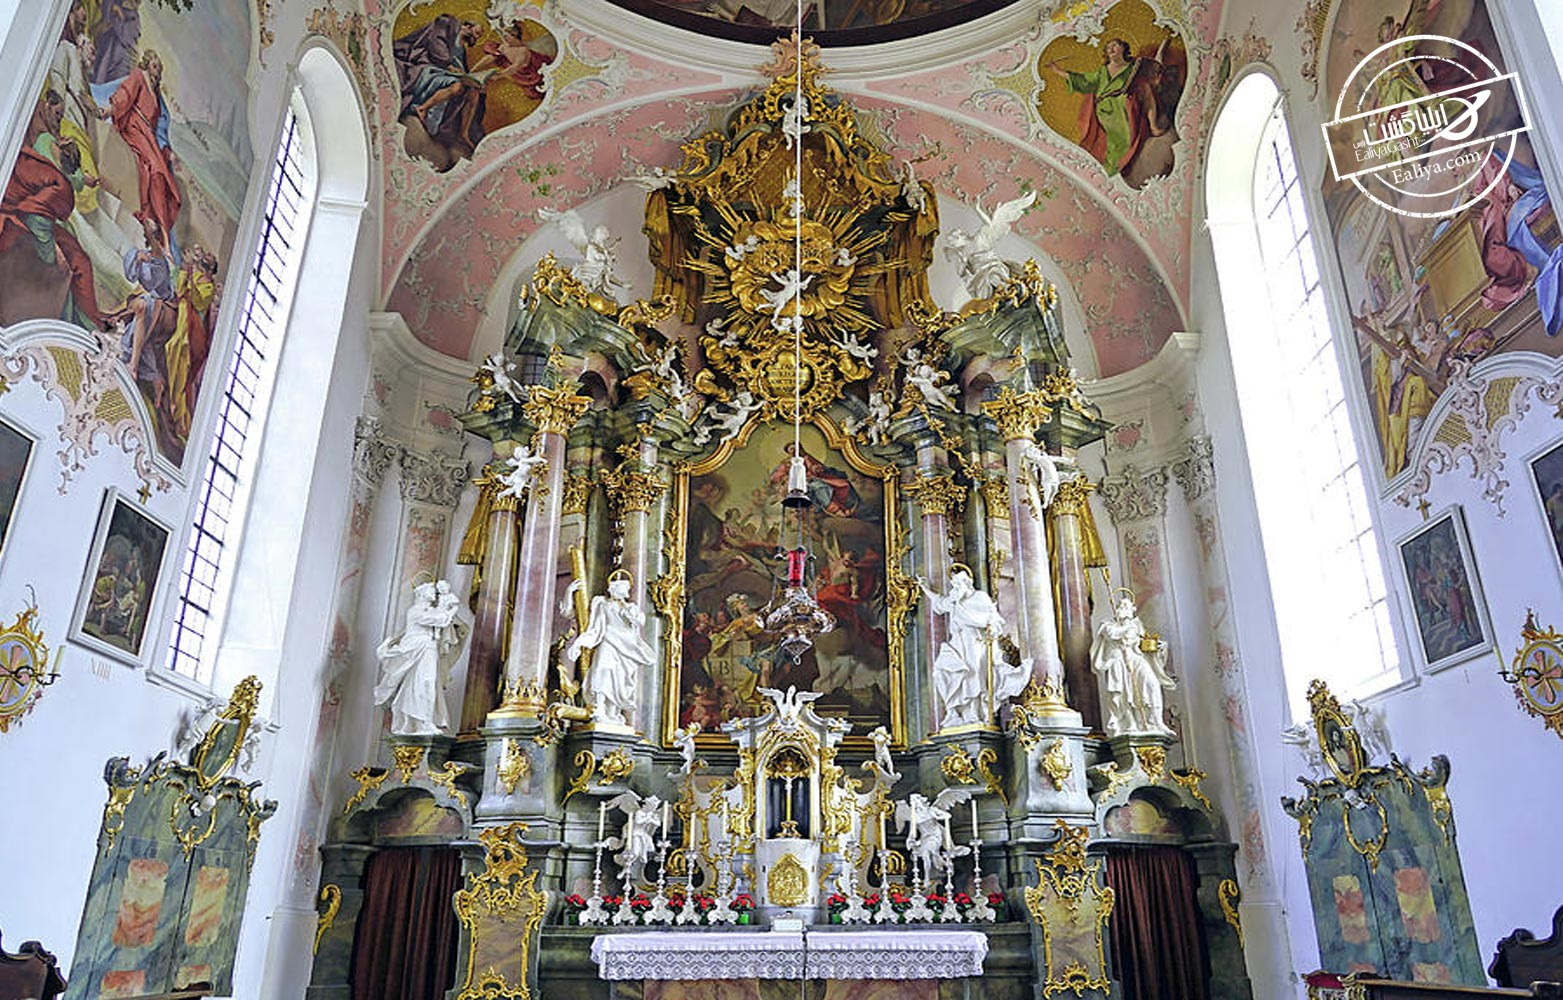 امروزه کلیسای سنت پاول